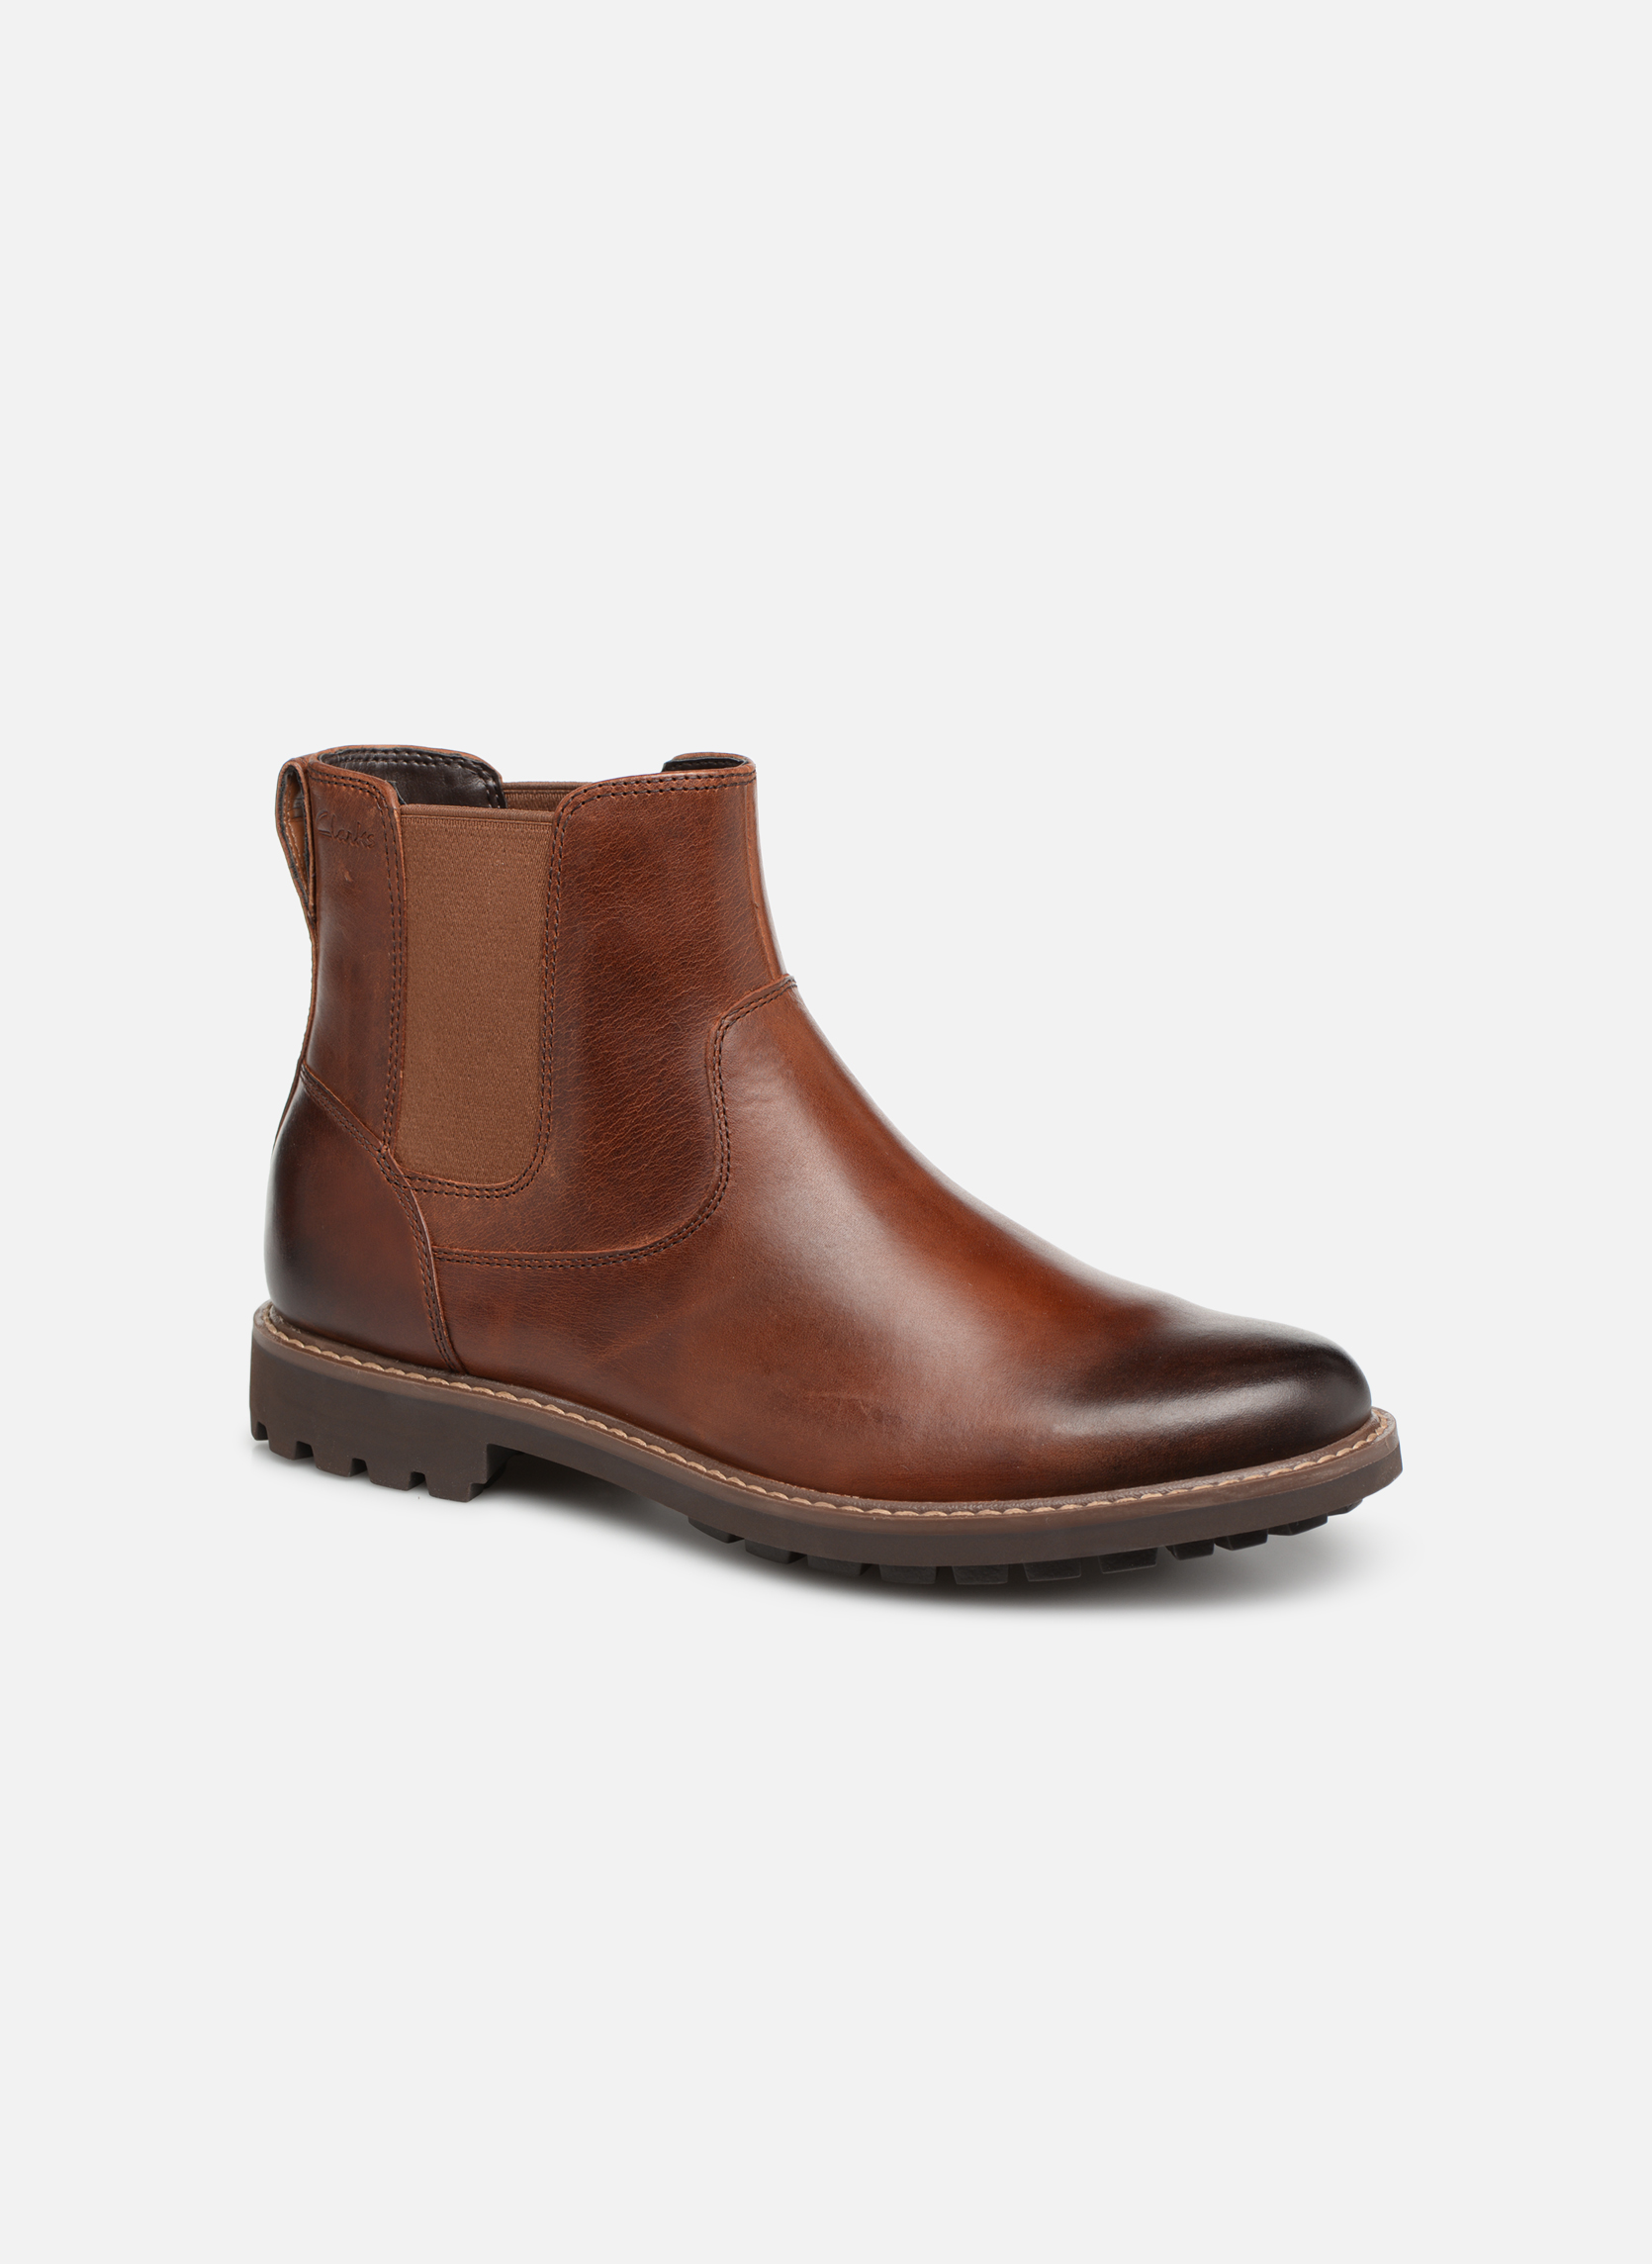 Boots en enkellaarsjes Montacute Top by Clarks